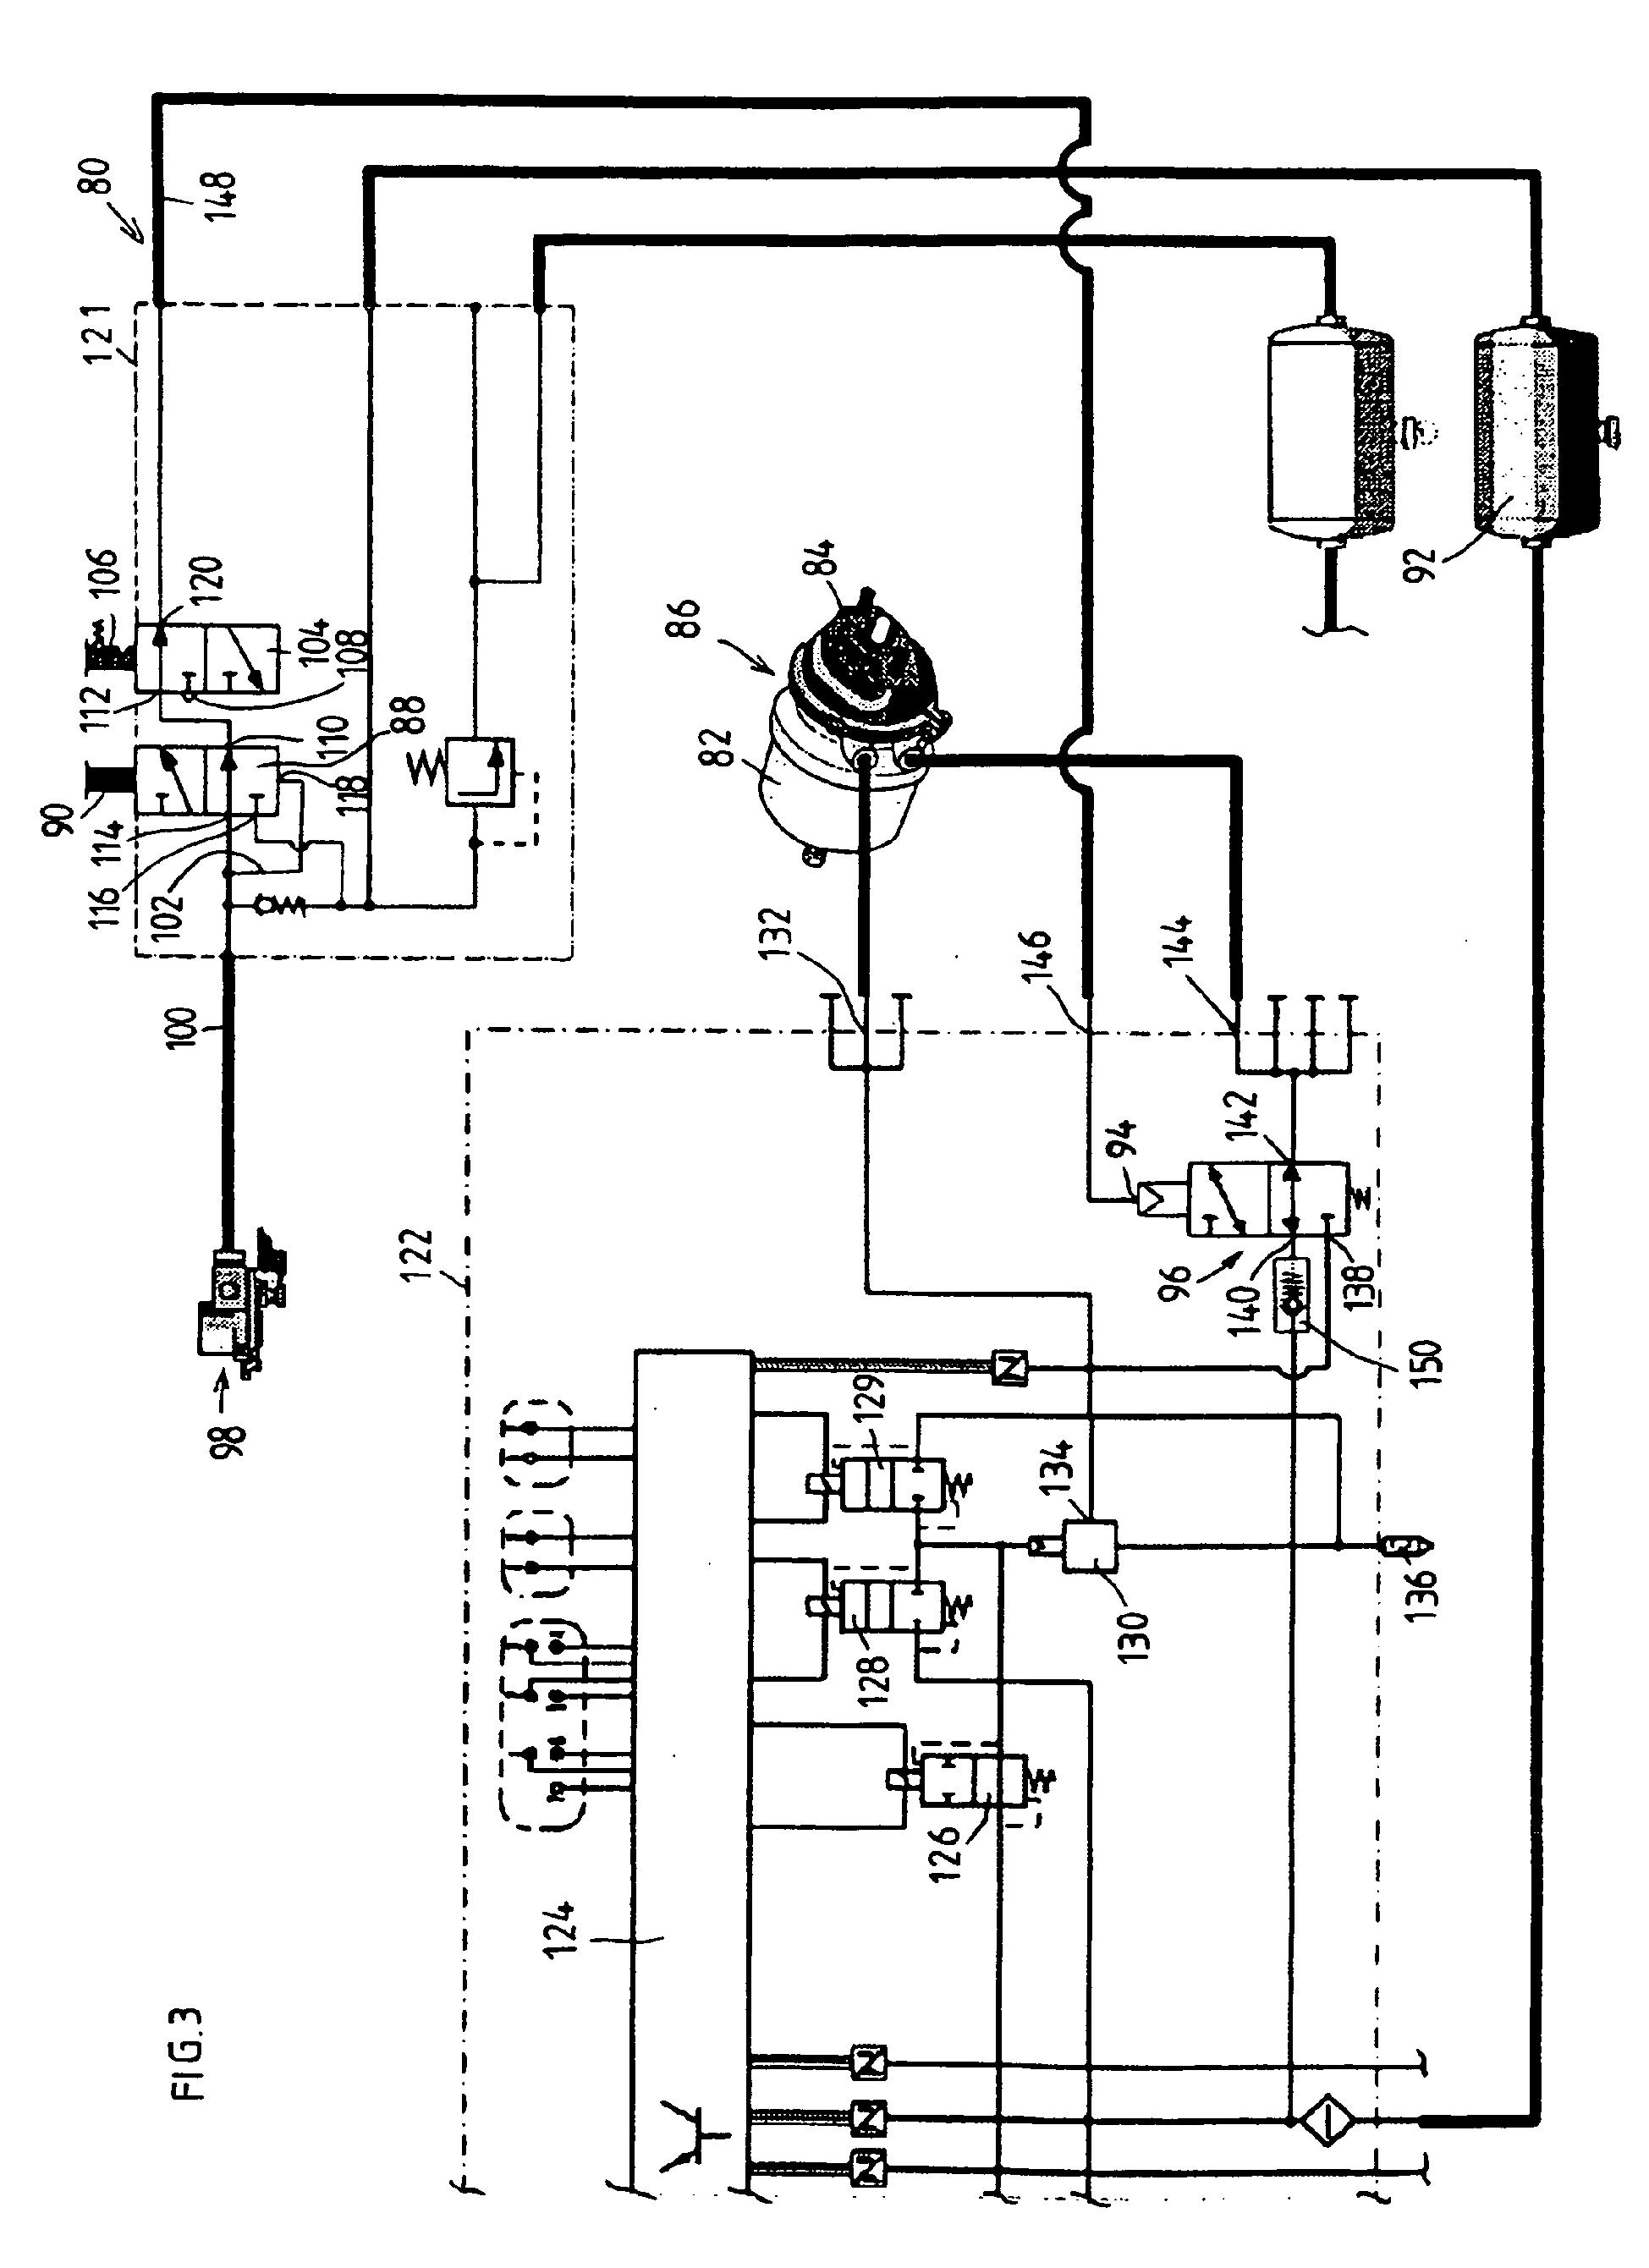 hendrickson air ride valve diagram